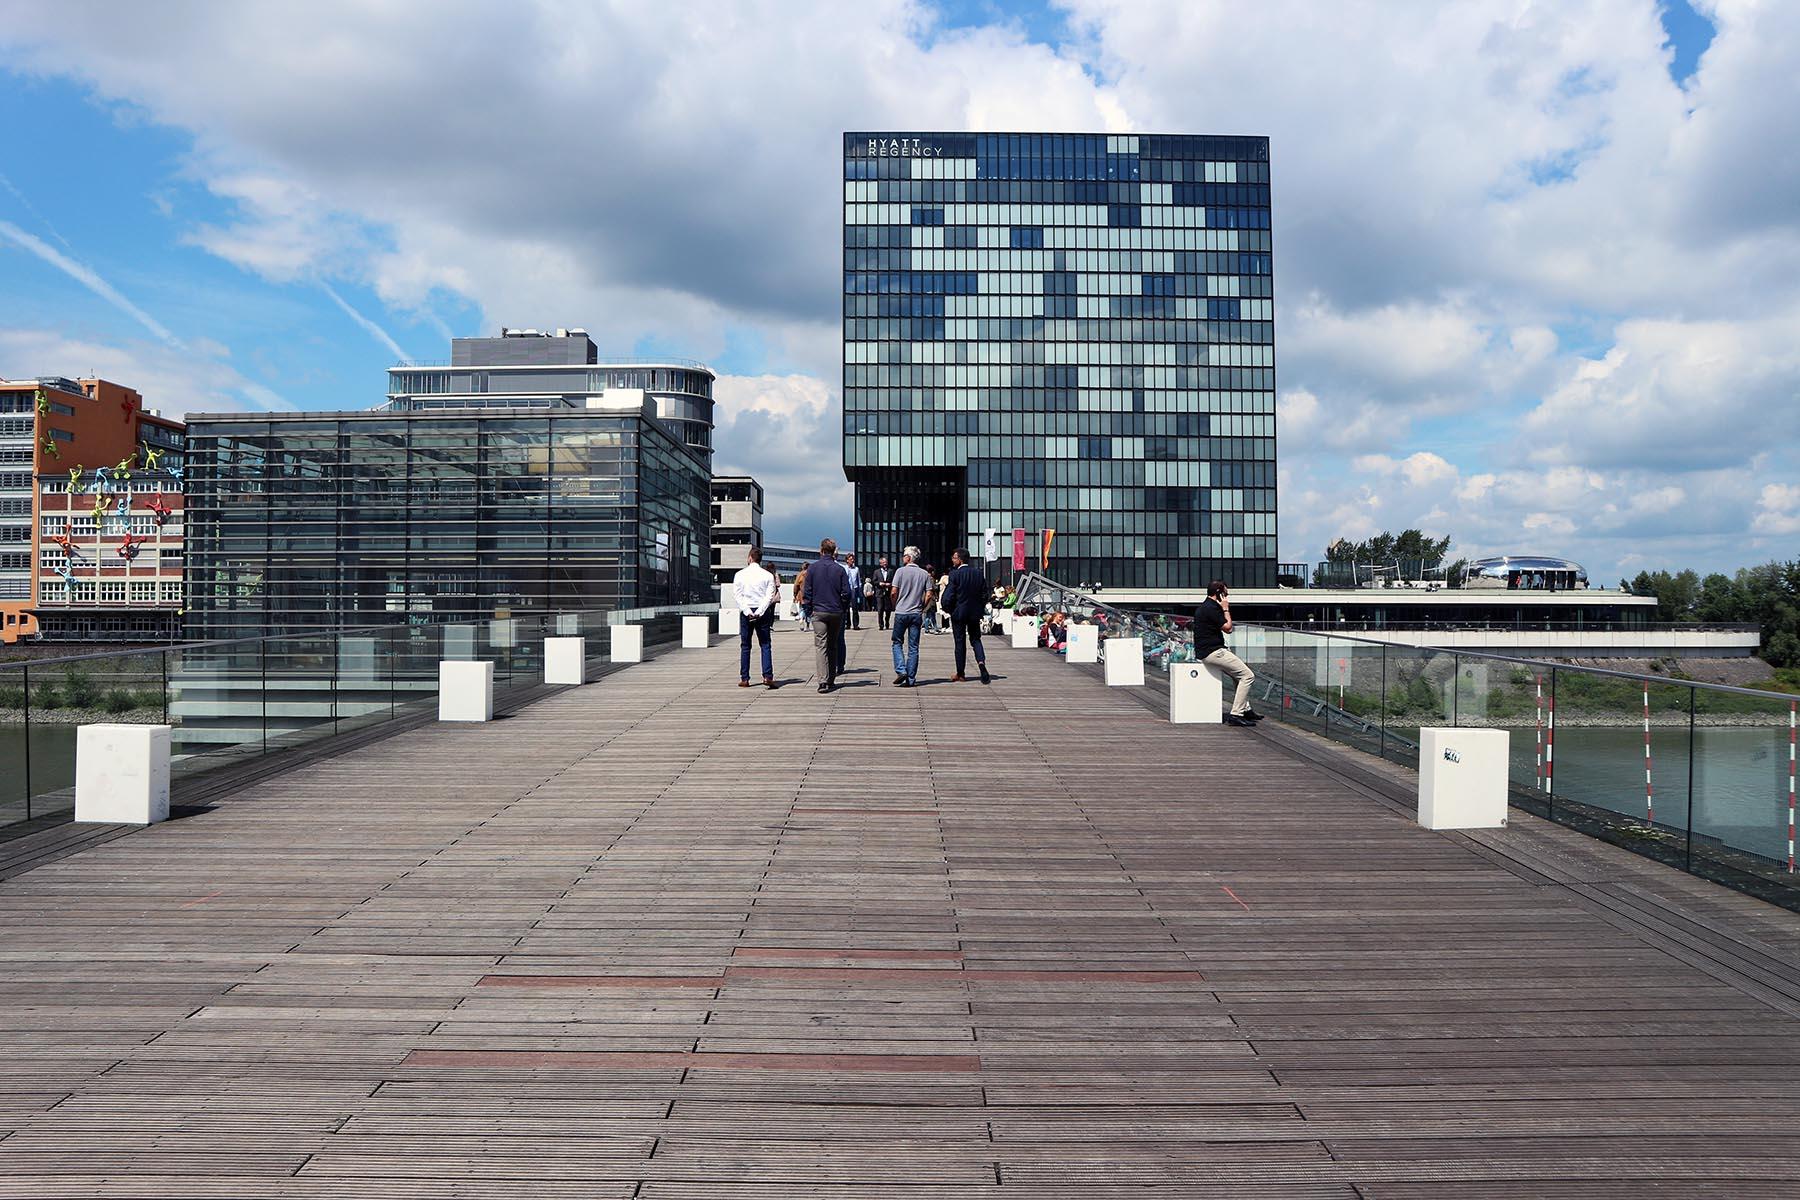 The Living Bridge.  Length 150 m by sop architekten (on behalf of JSK architects). Completion: 2005.